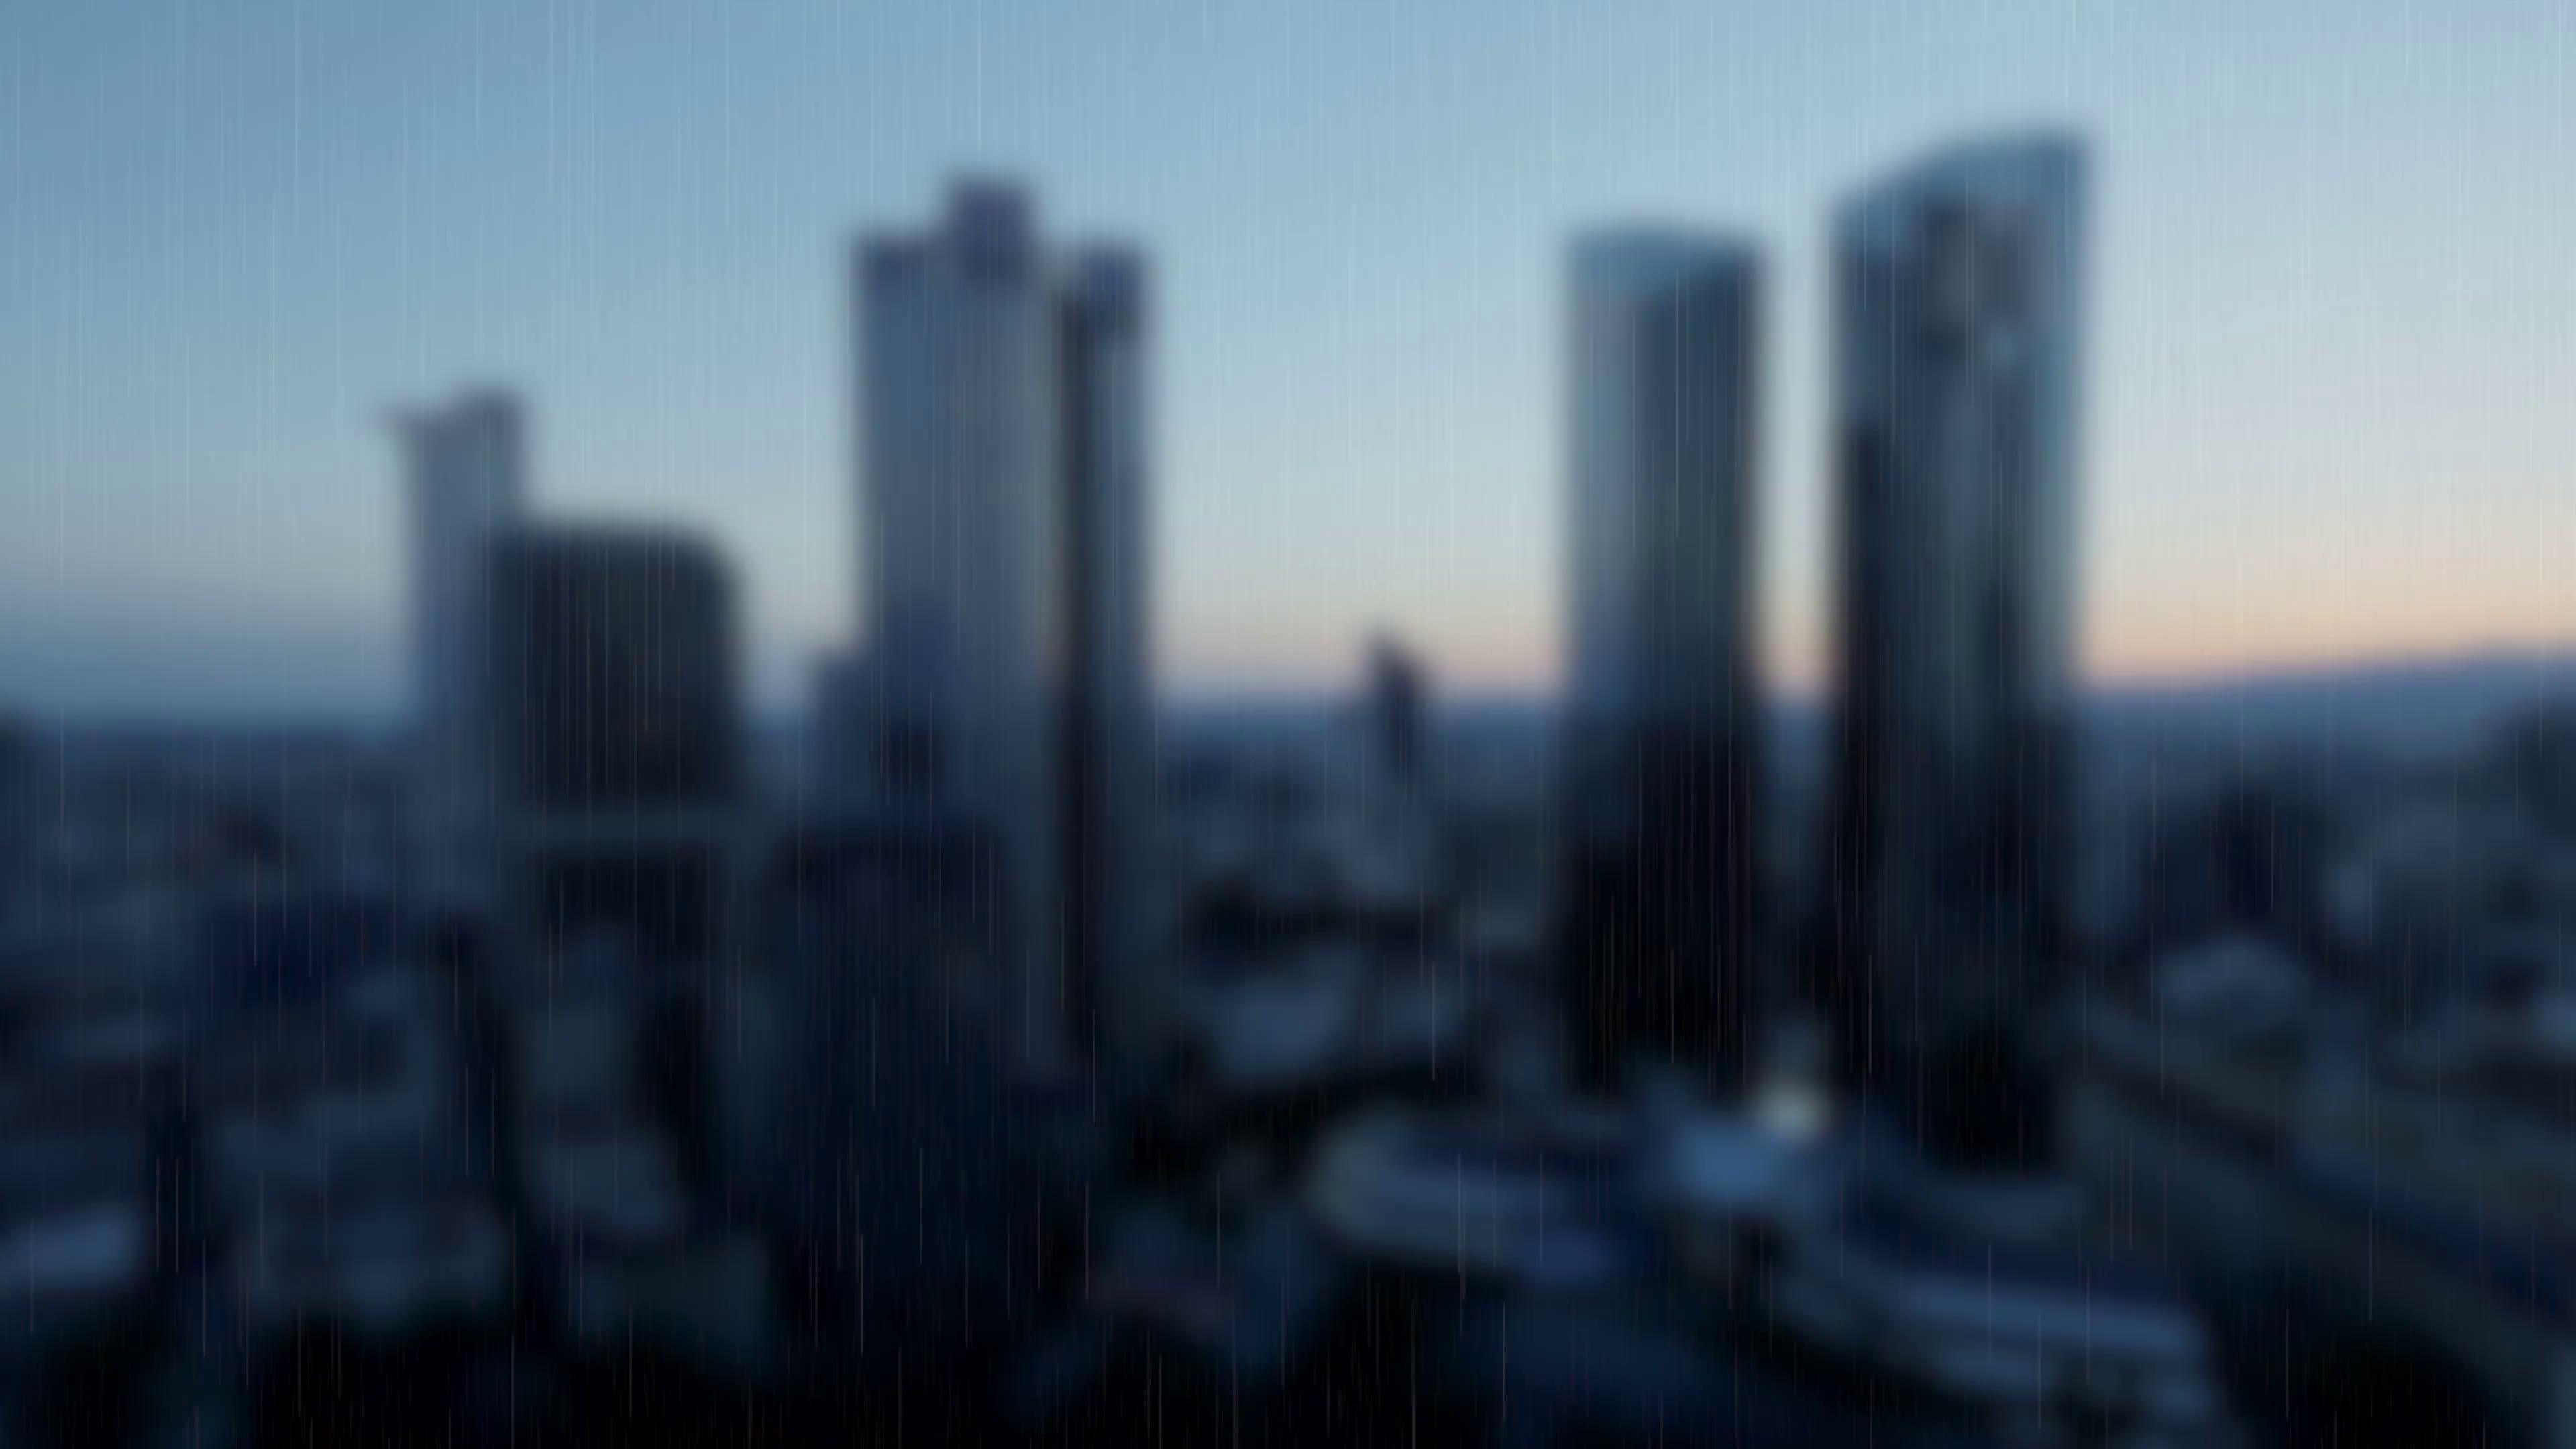 rainy day rain raining blurred background skyline skyscrapers 3840x2160